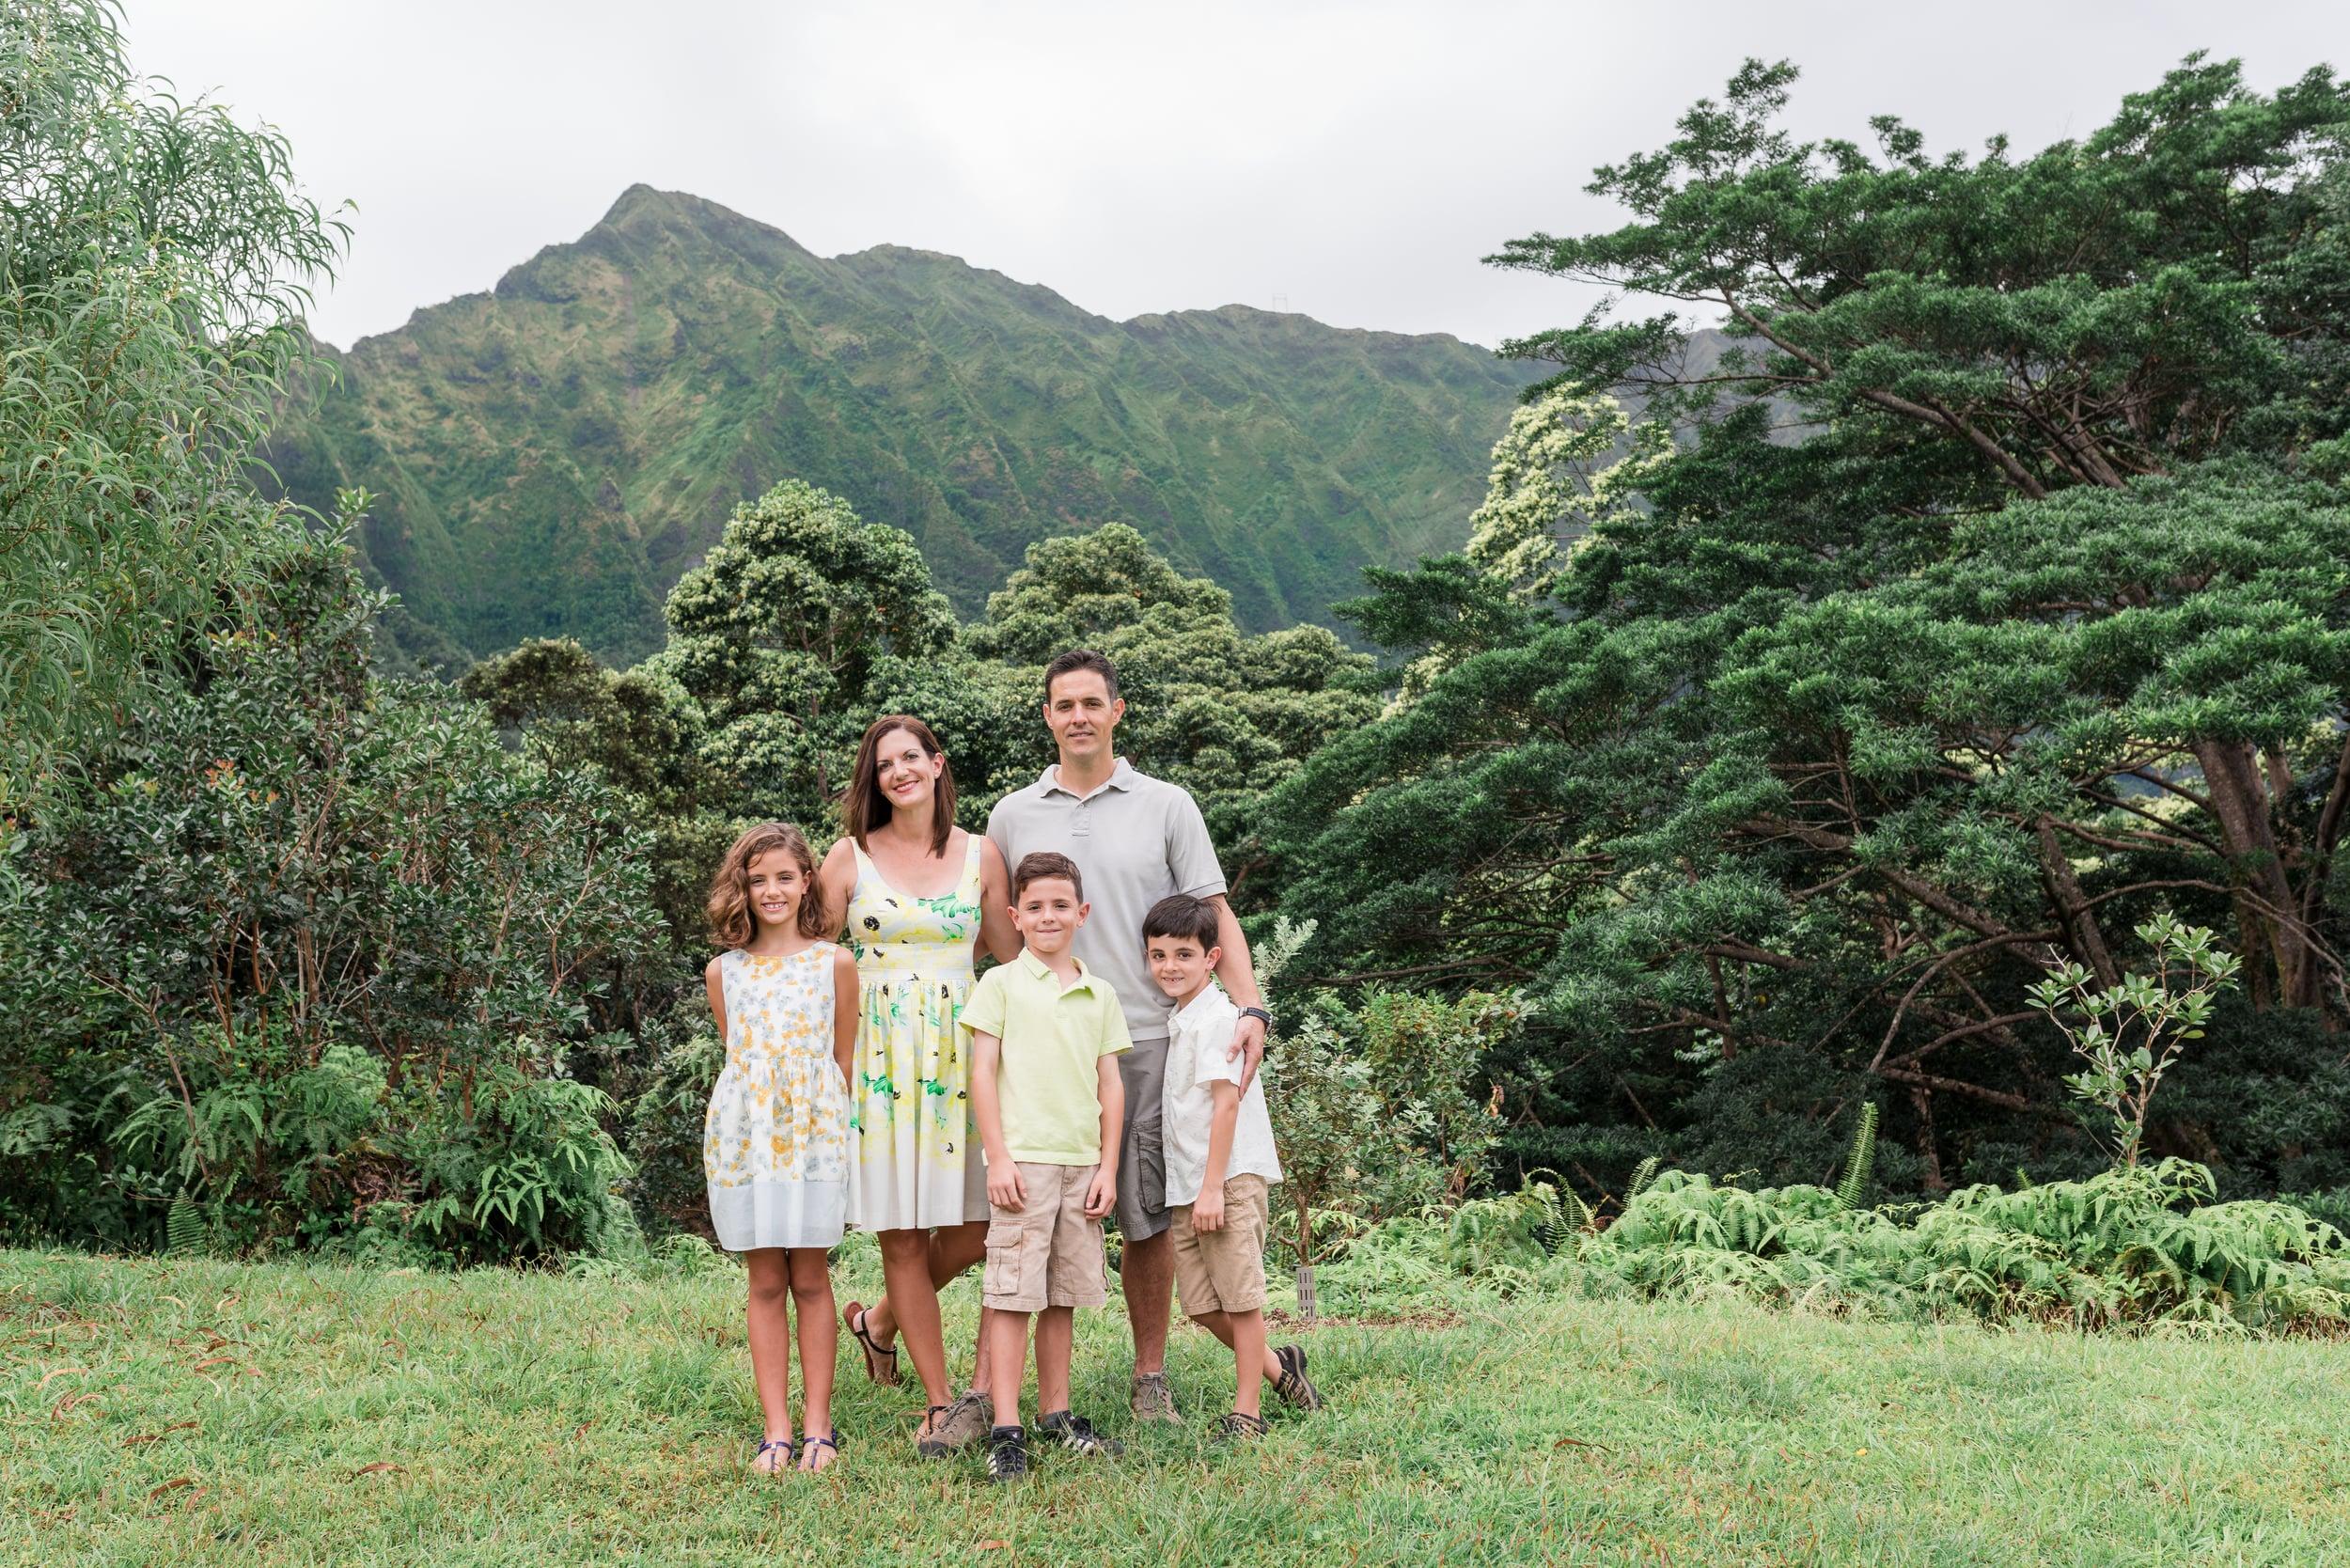 Oahu Family Photographer - Family portrait session